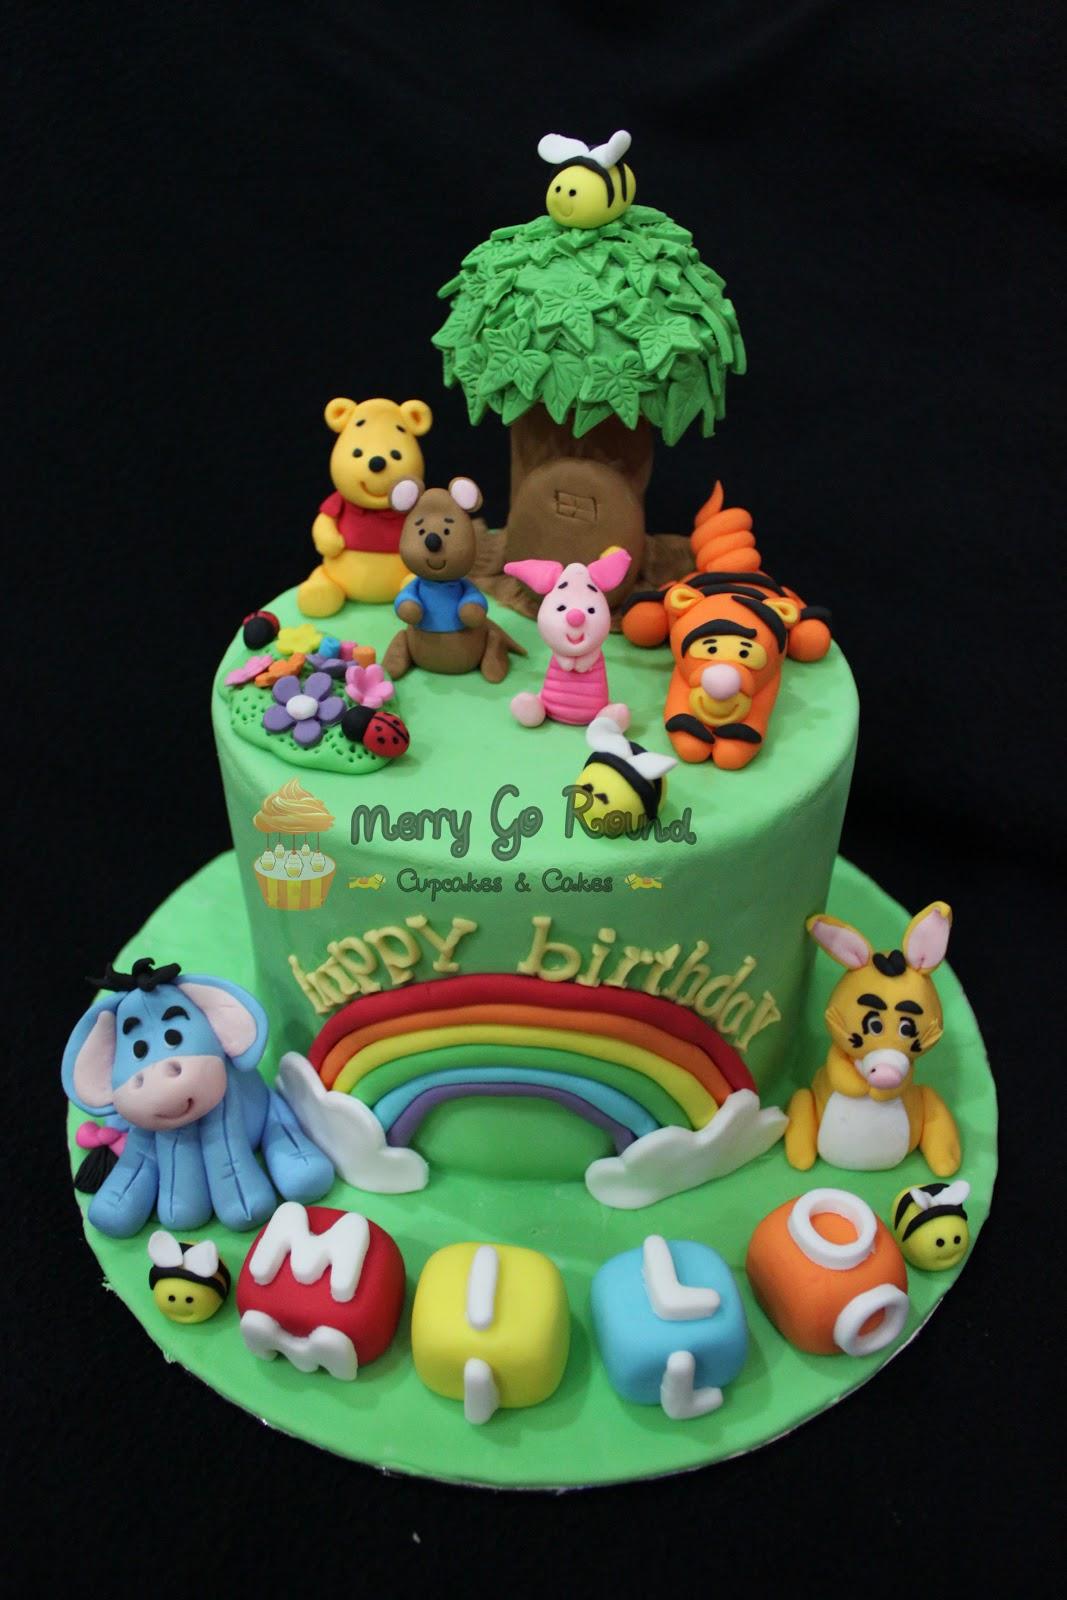 Merry Go Round Cupcakes Amp Cakes Winnie The Pooh